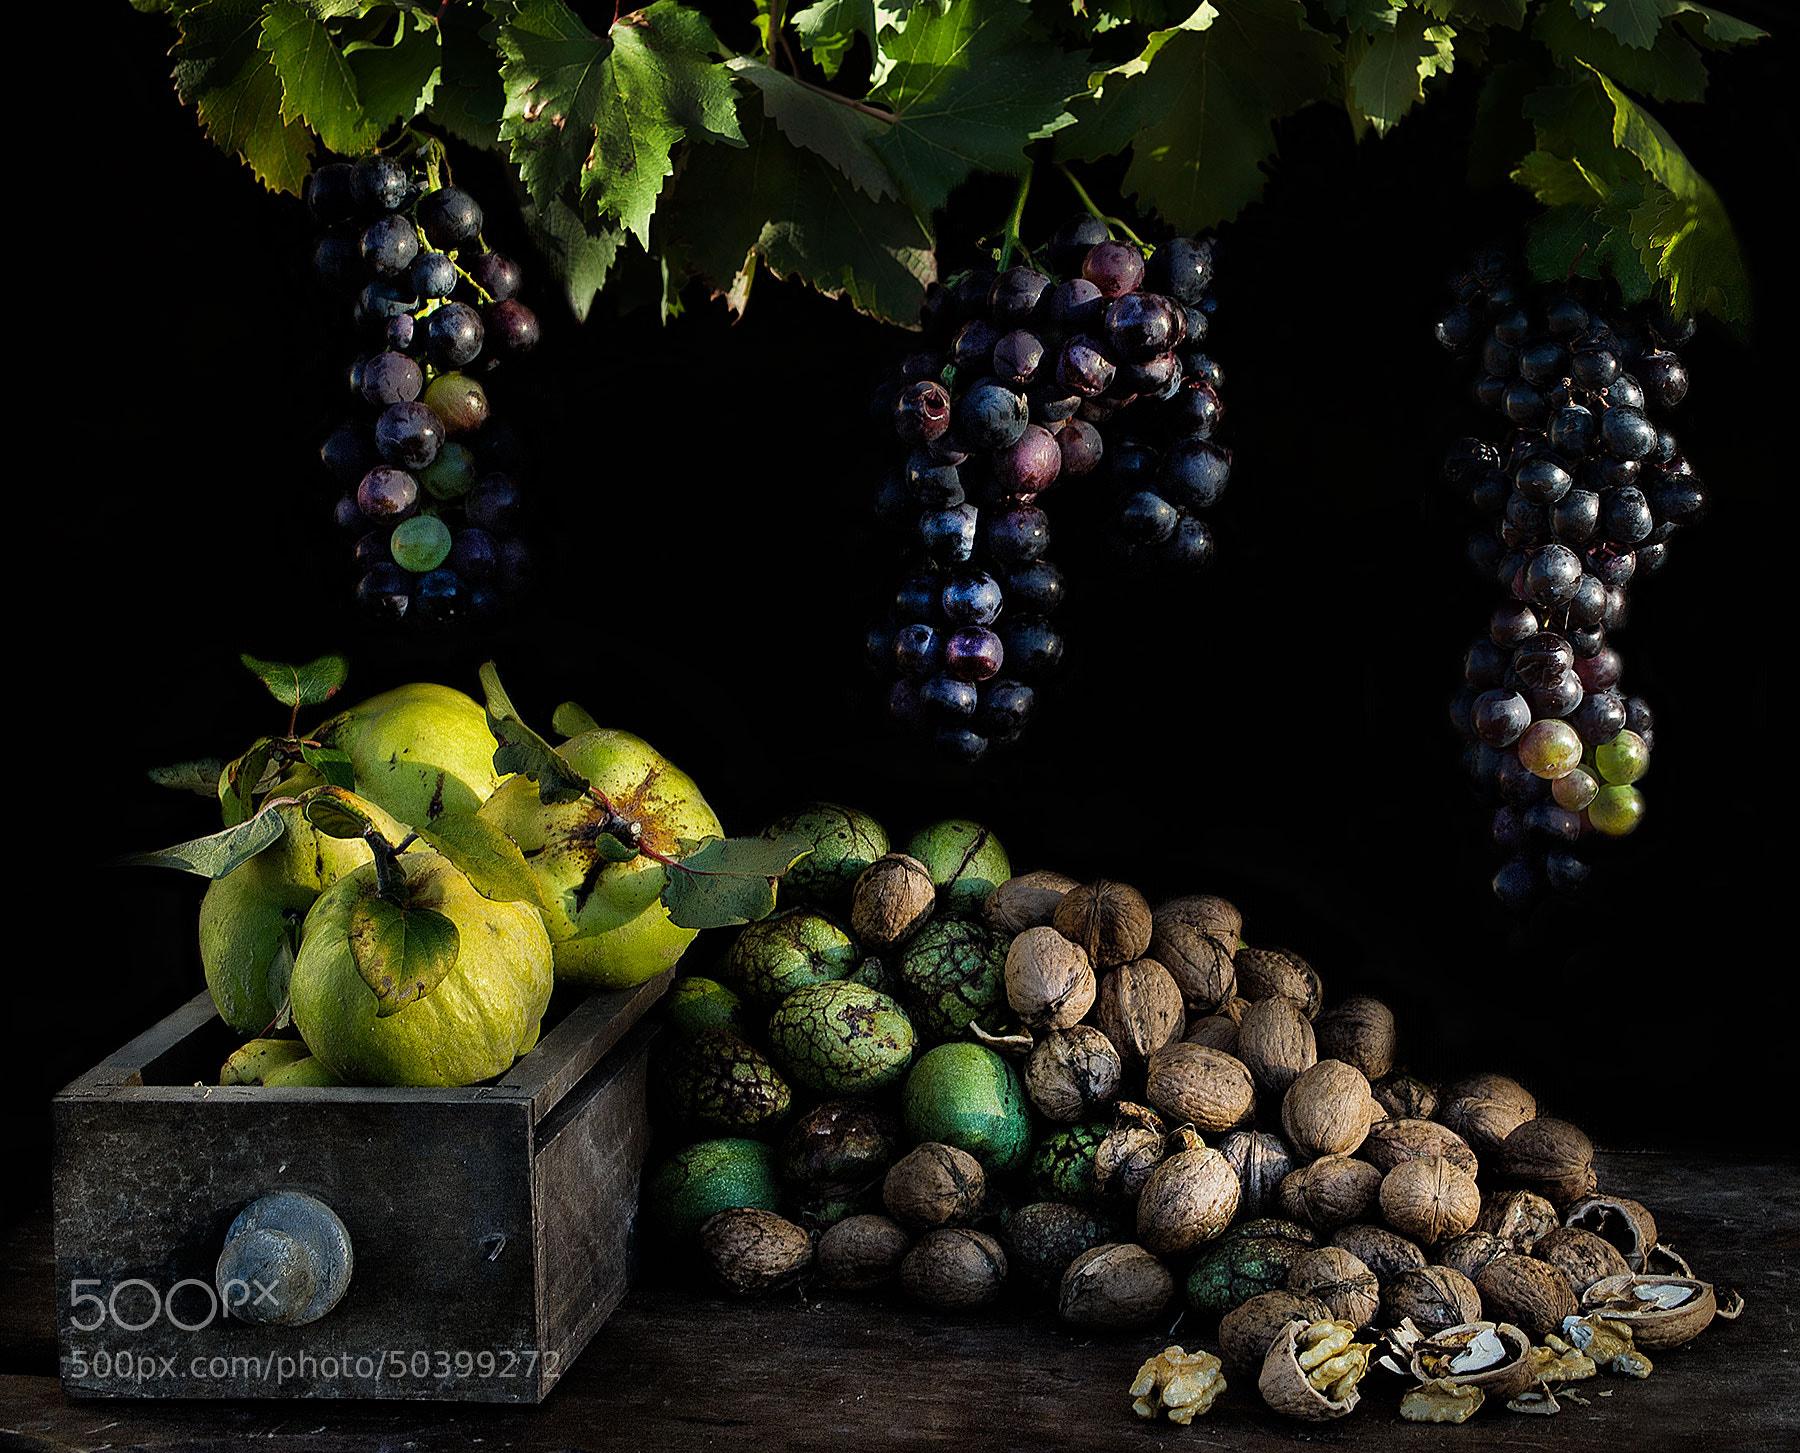 Photograph My treasure by Marta Borreguero on 500px